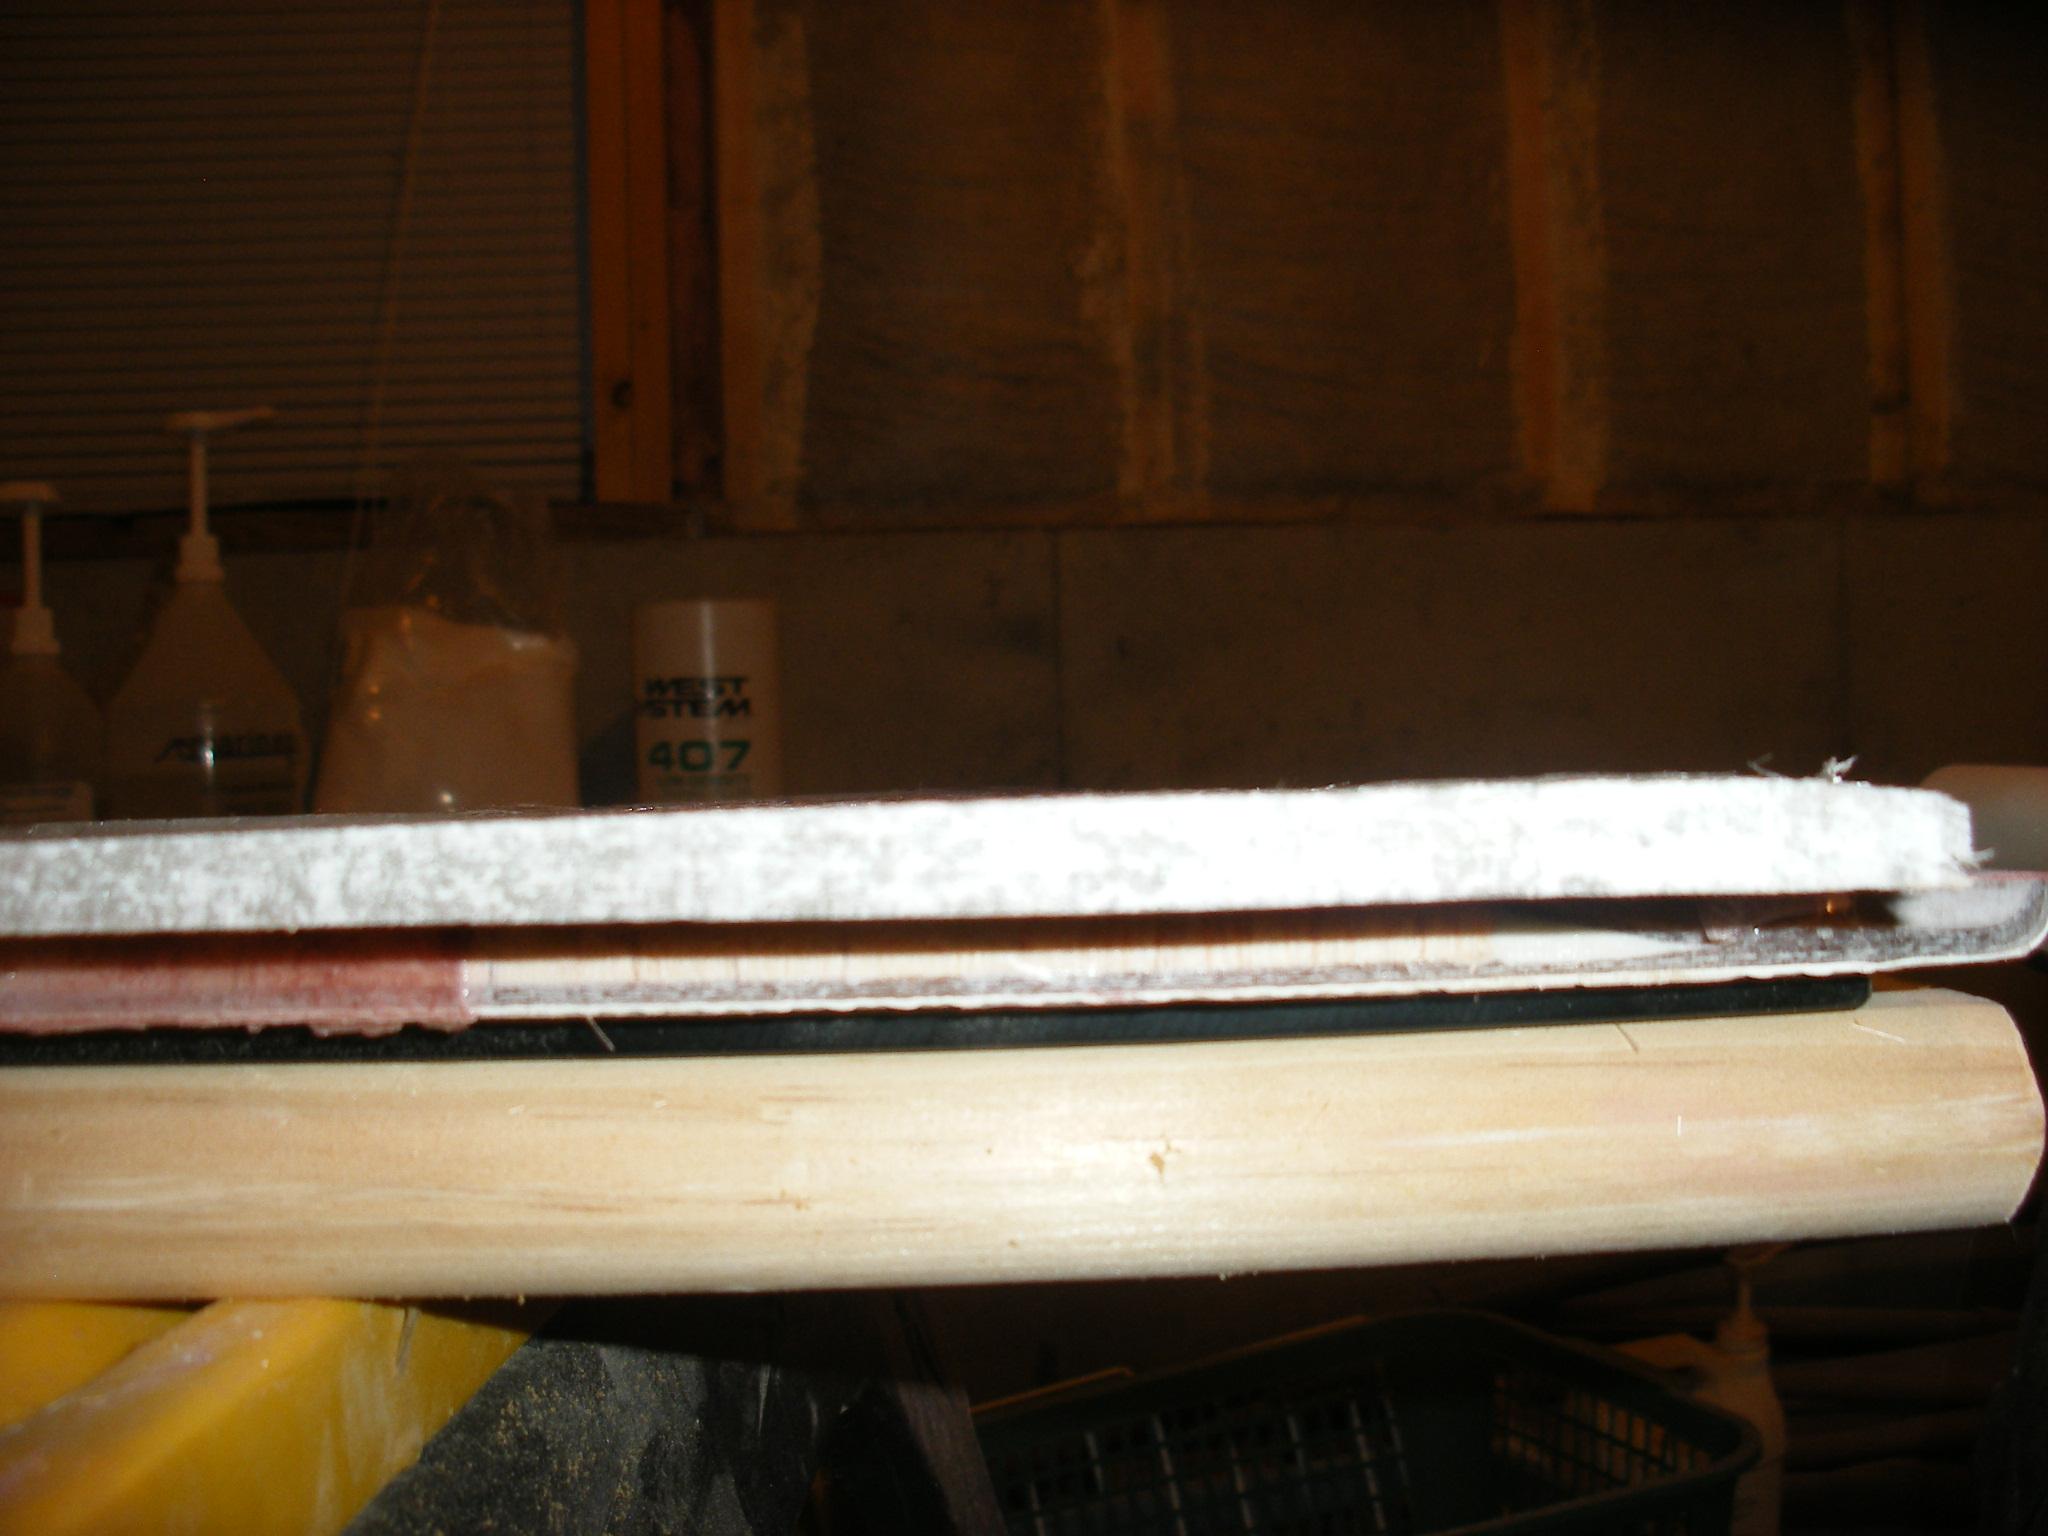 "1/2"" fiberglass bonded to the original lid.  Balsa wood core sealed with epoxy."